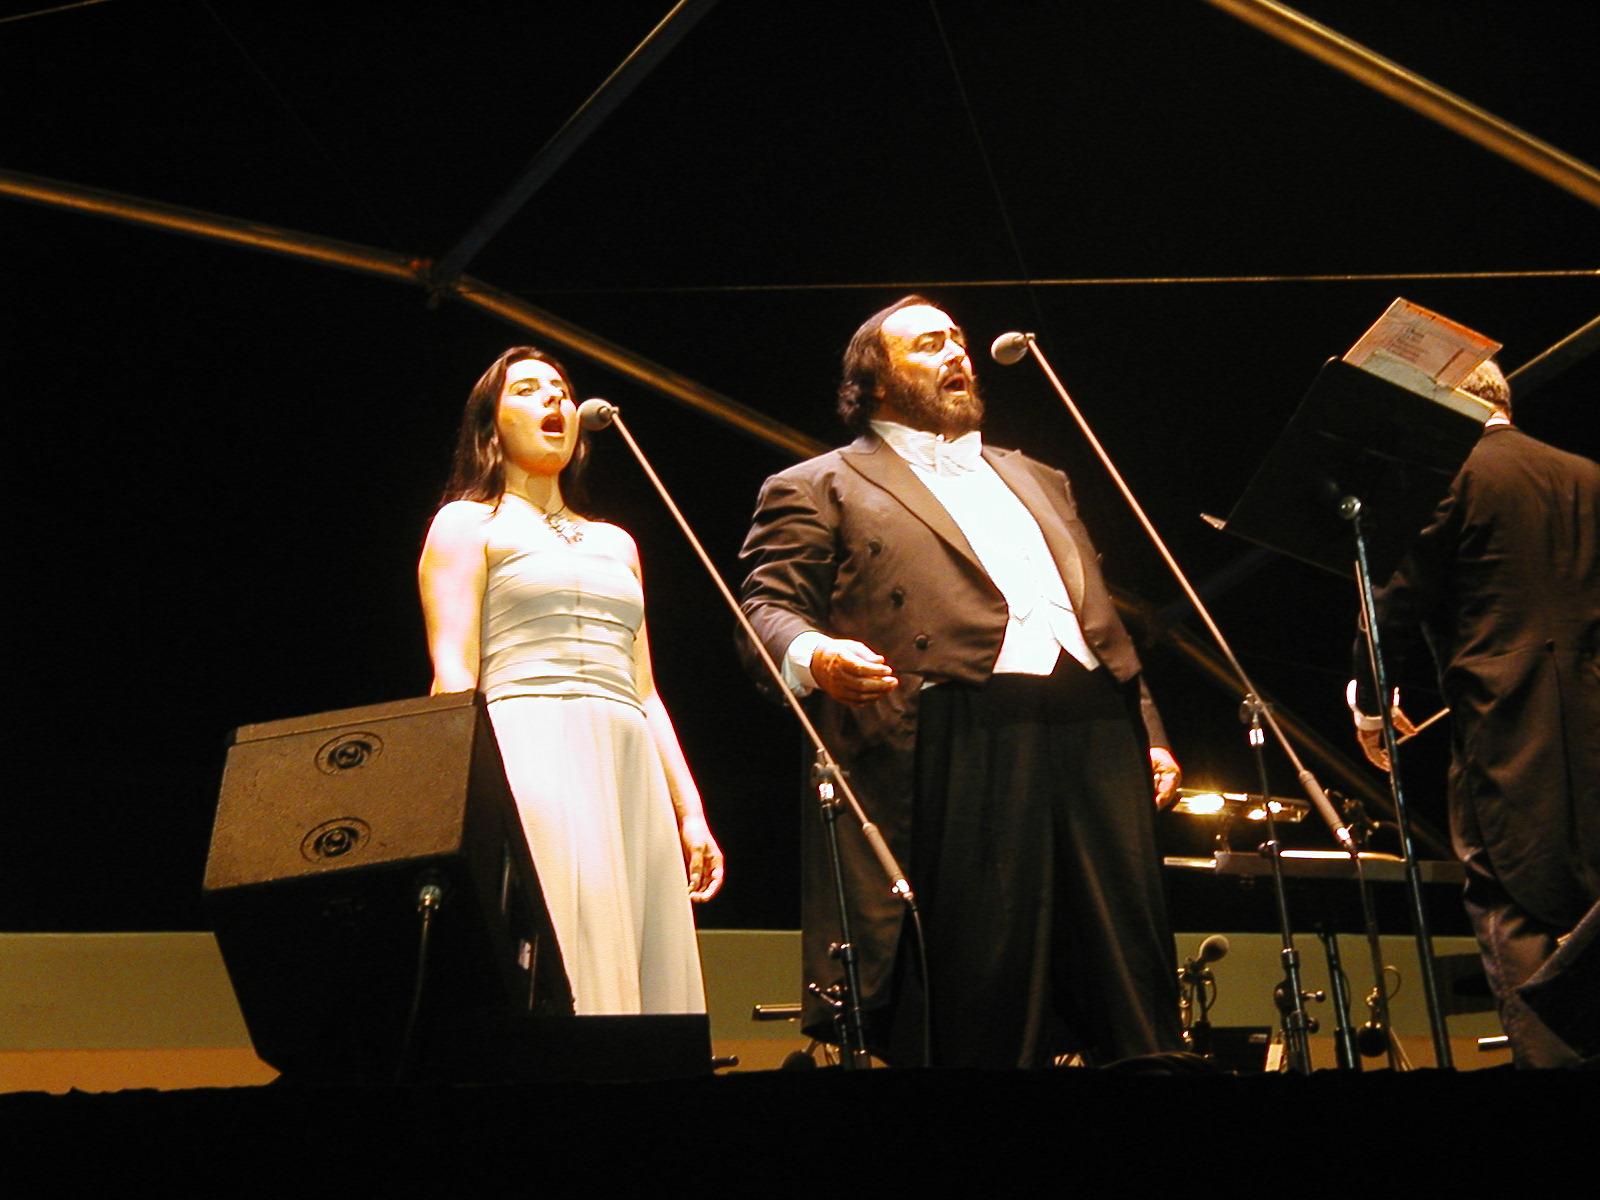 Luciano Pavarotti Geburtstag